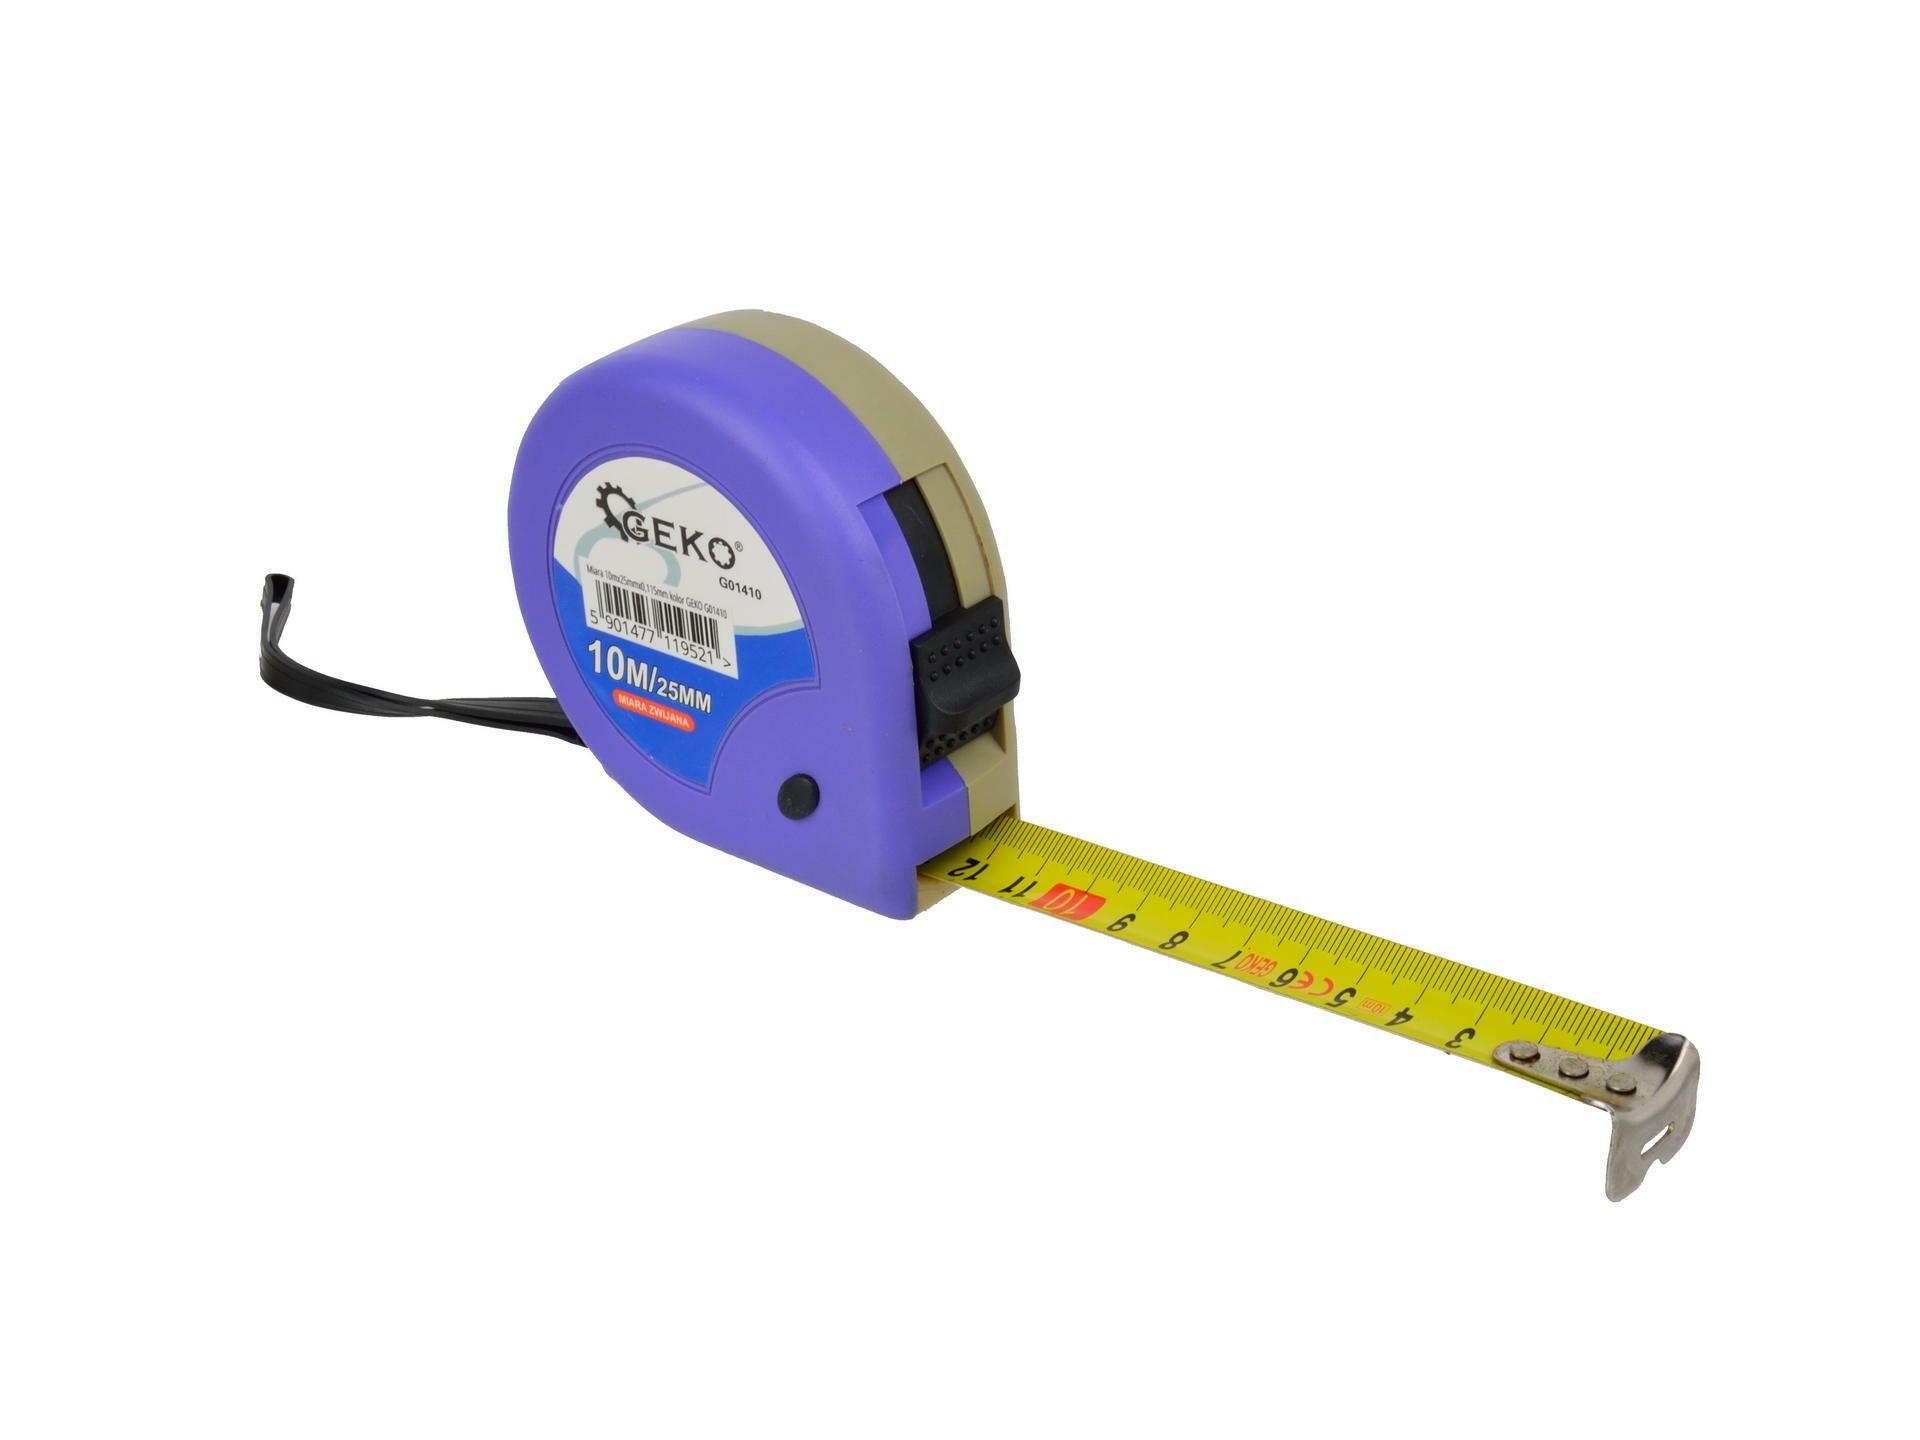 Metr svinovací, 10m, š. pásku 25mm, GEKO